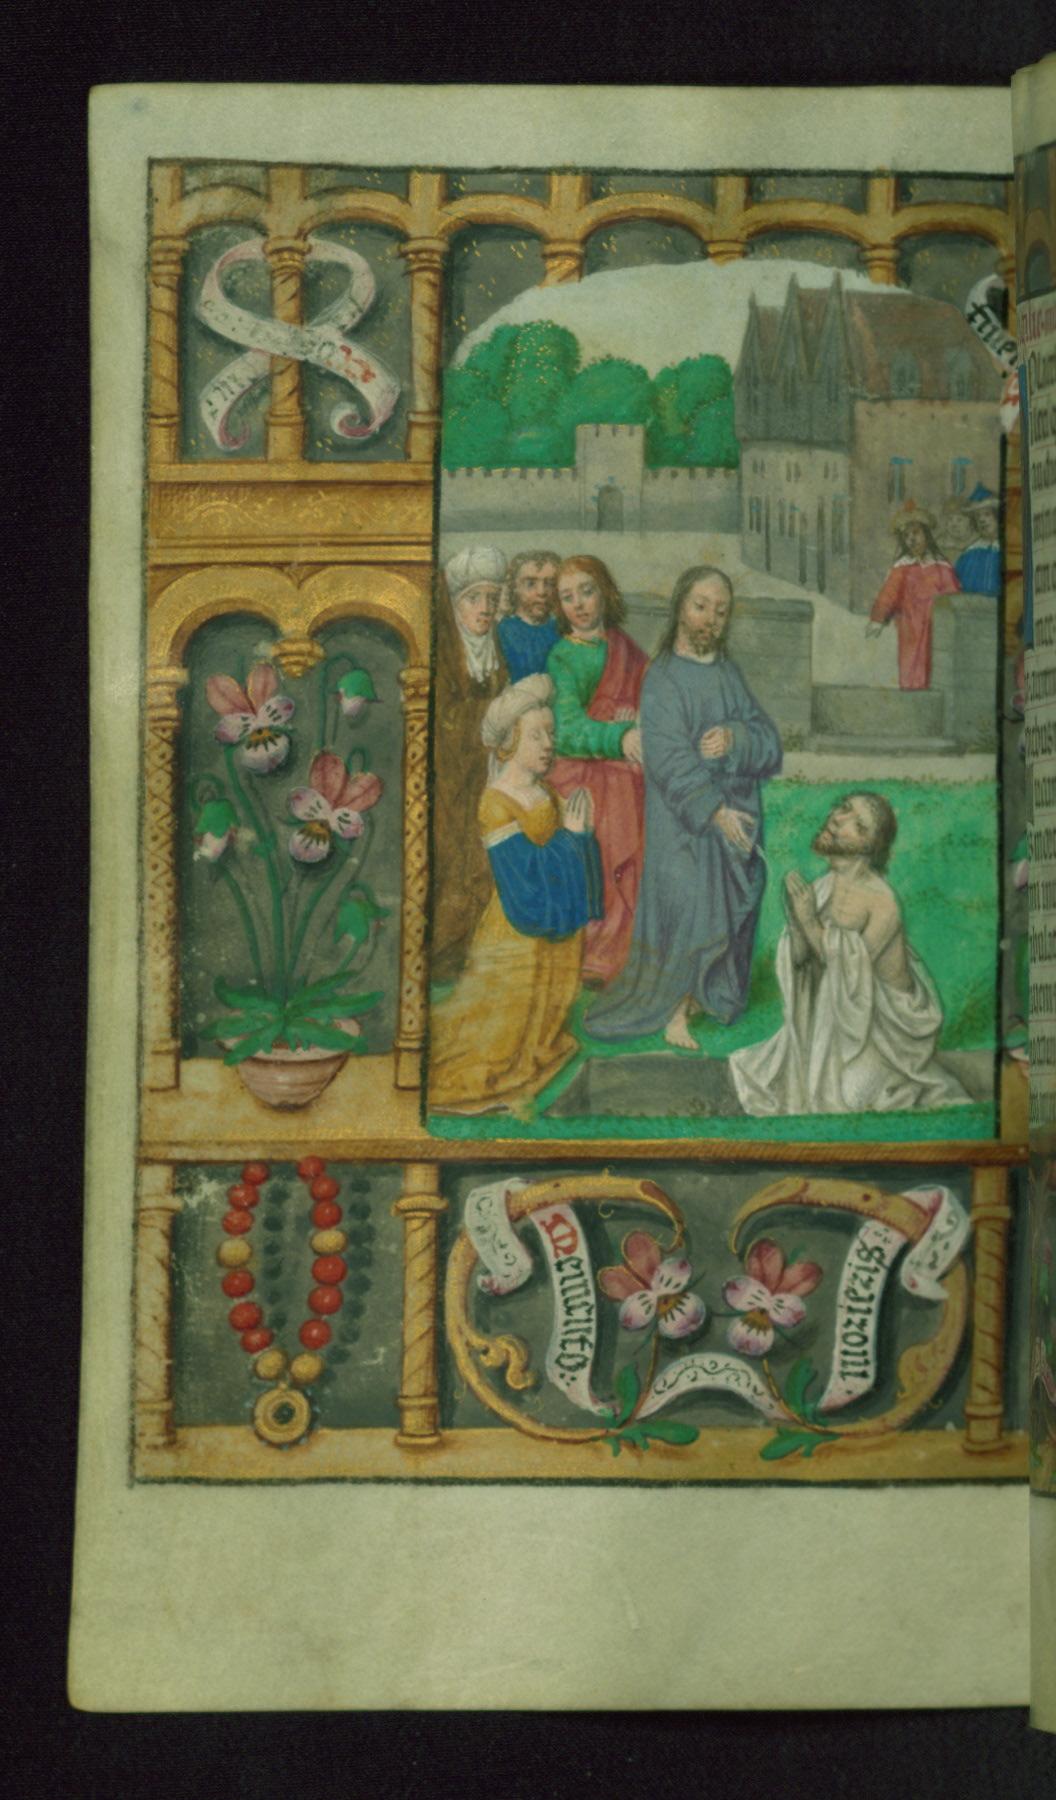 Book of Hours 1500 ca Ms. W.427 Walters Art Museum Baltimore Resurrection de Lazare fol 158v